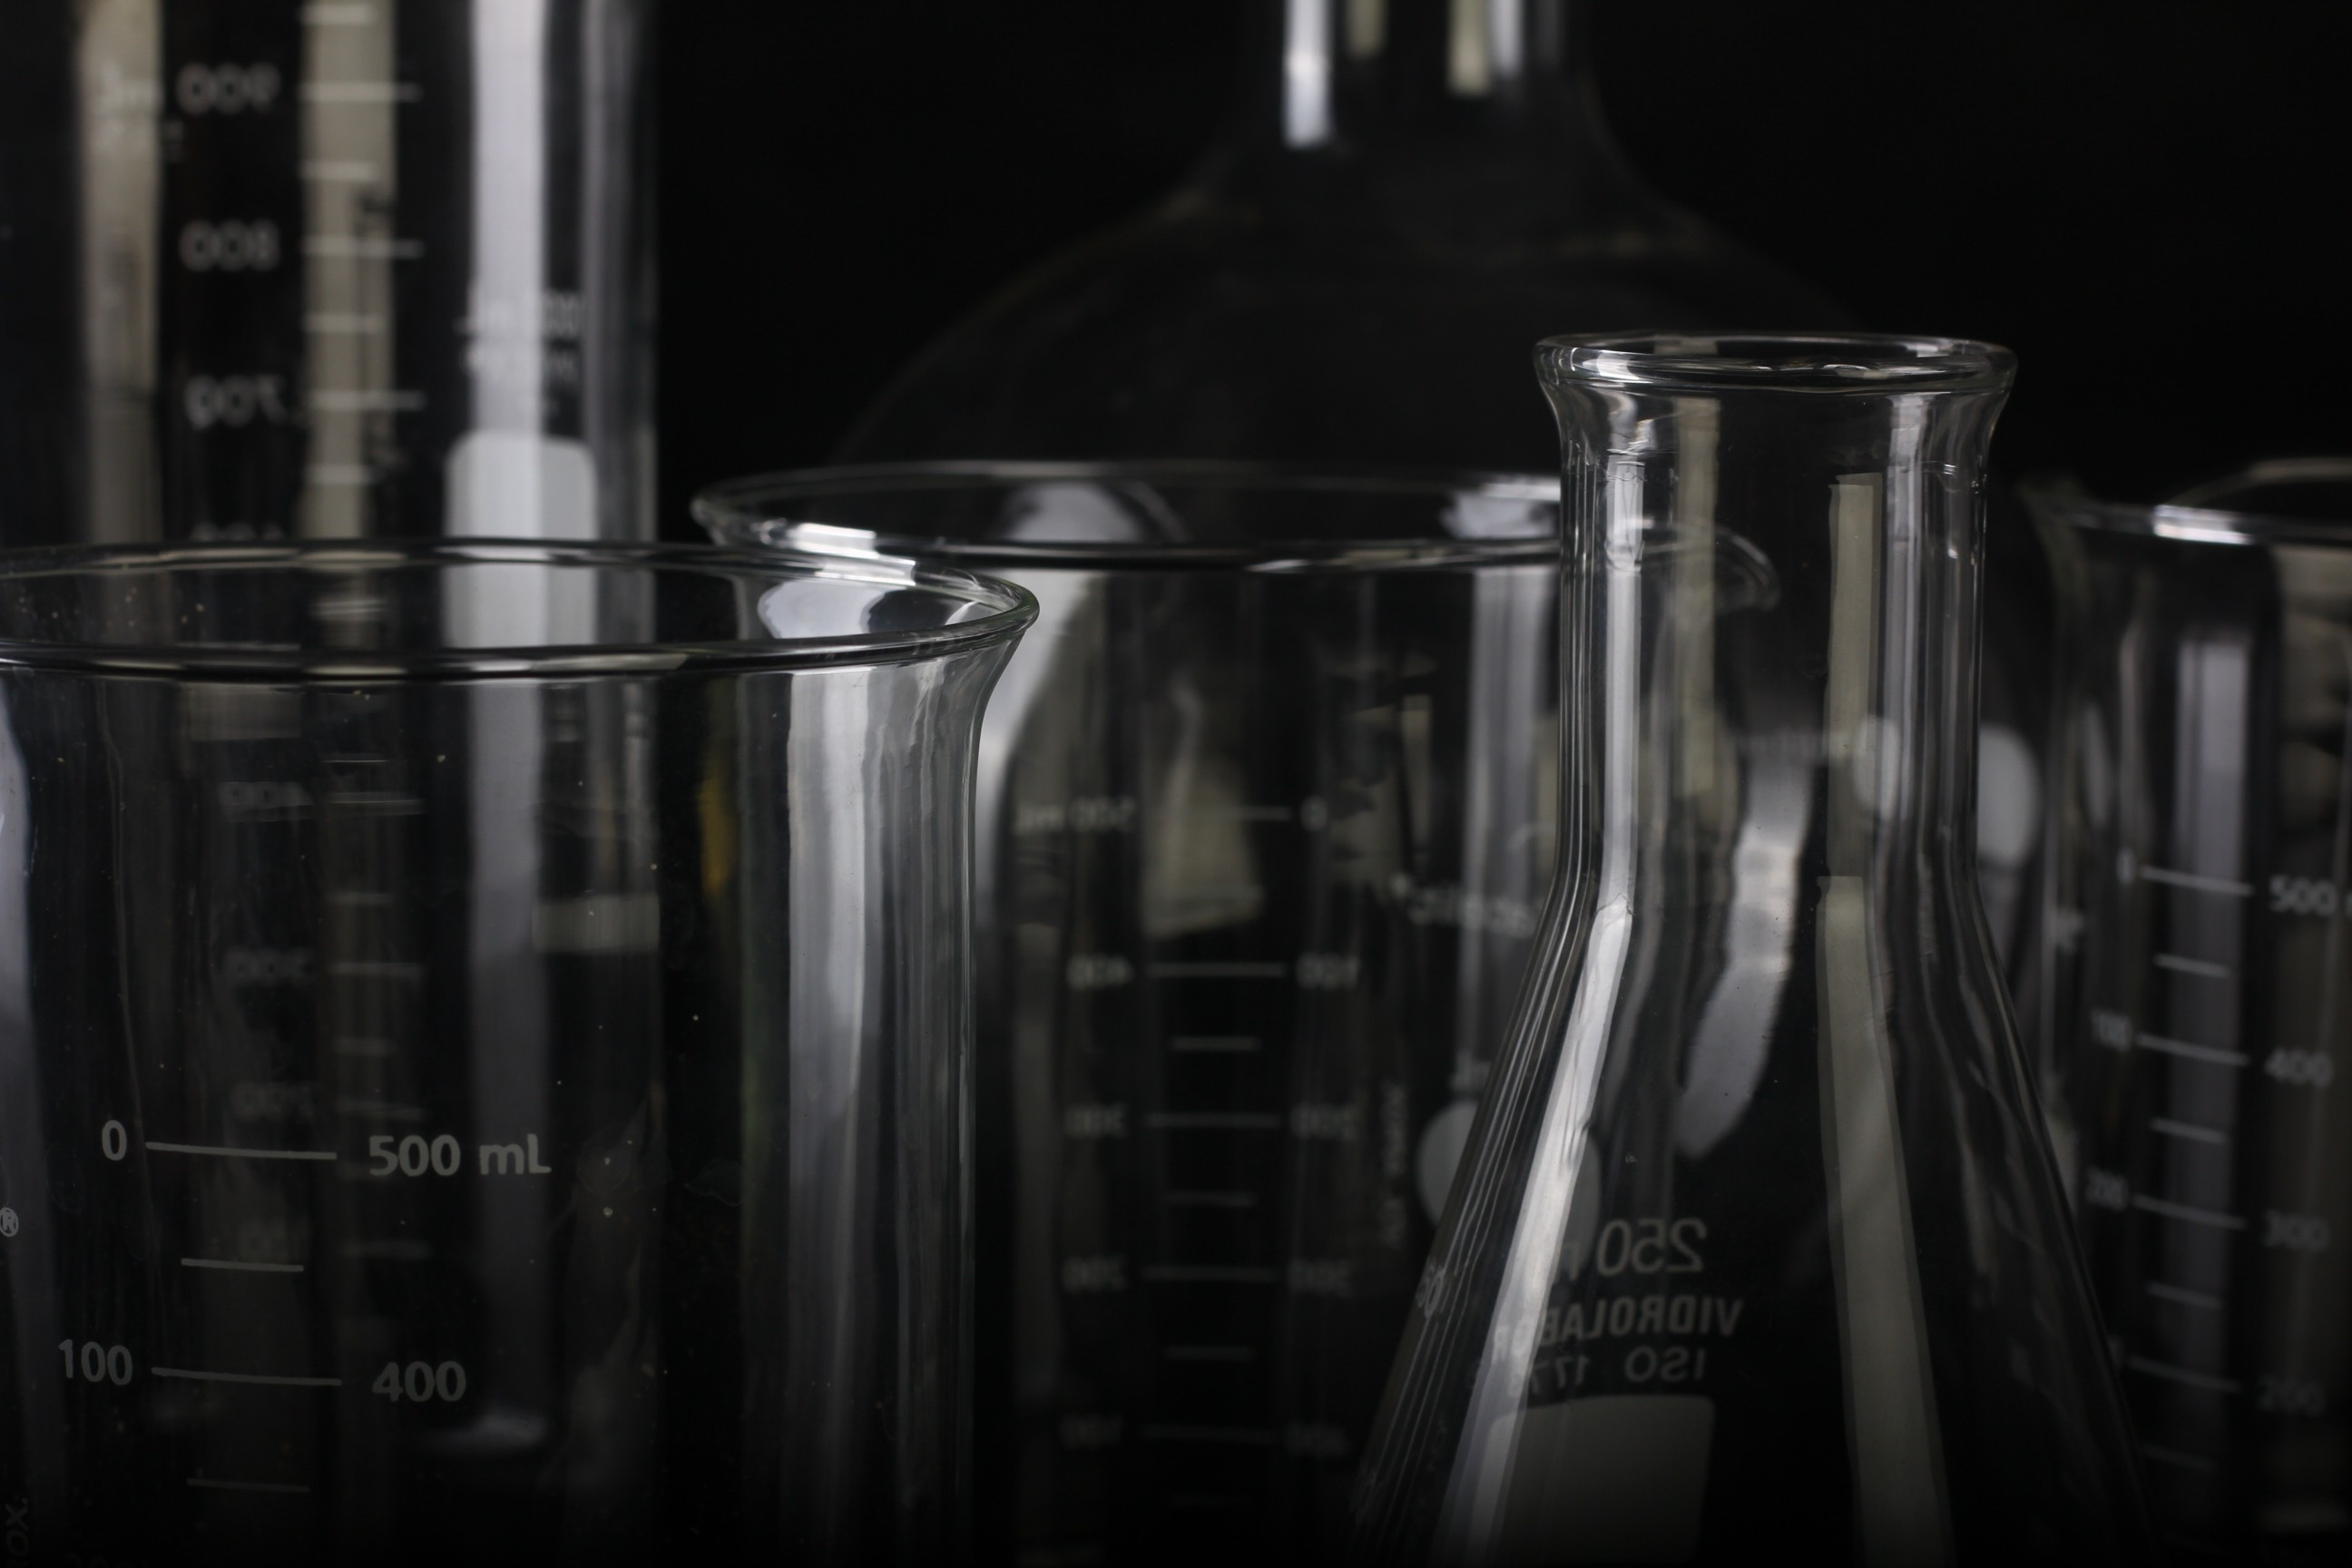 Olika typer av laboratorieutrustning | Biztrends